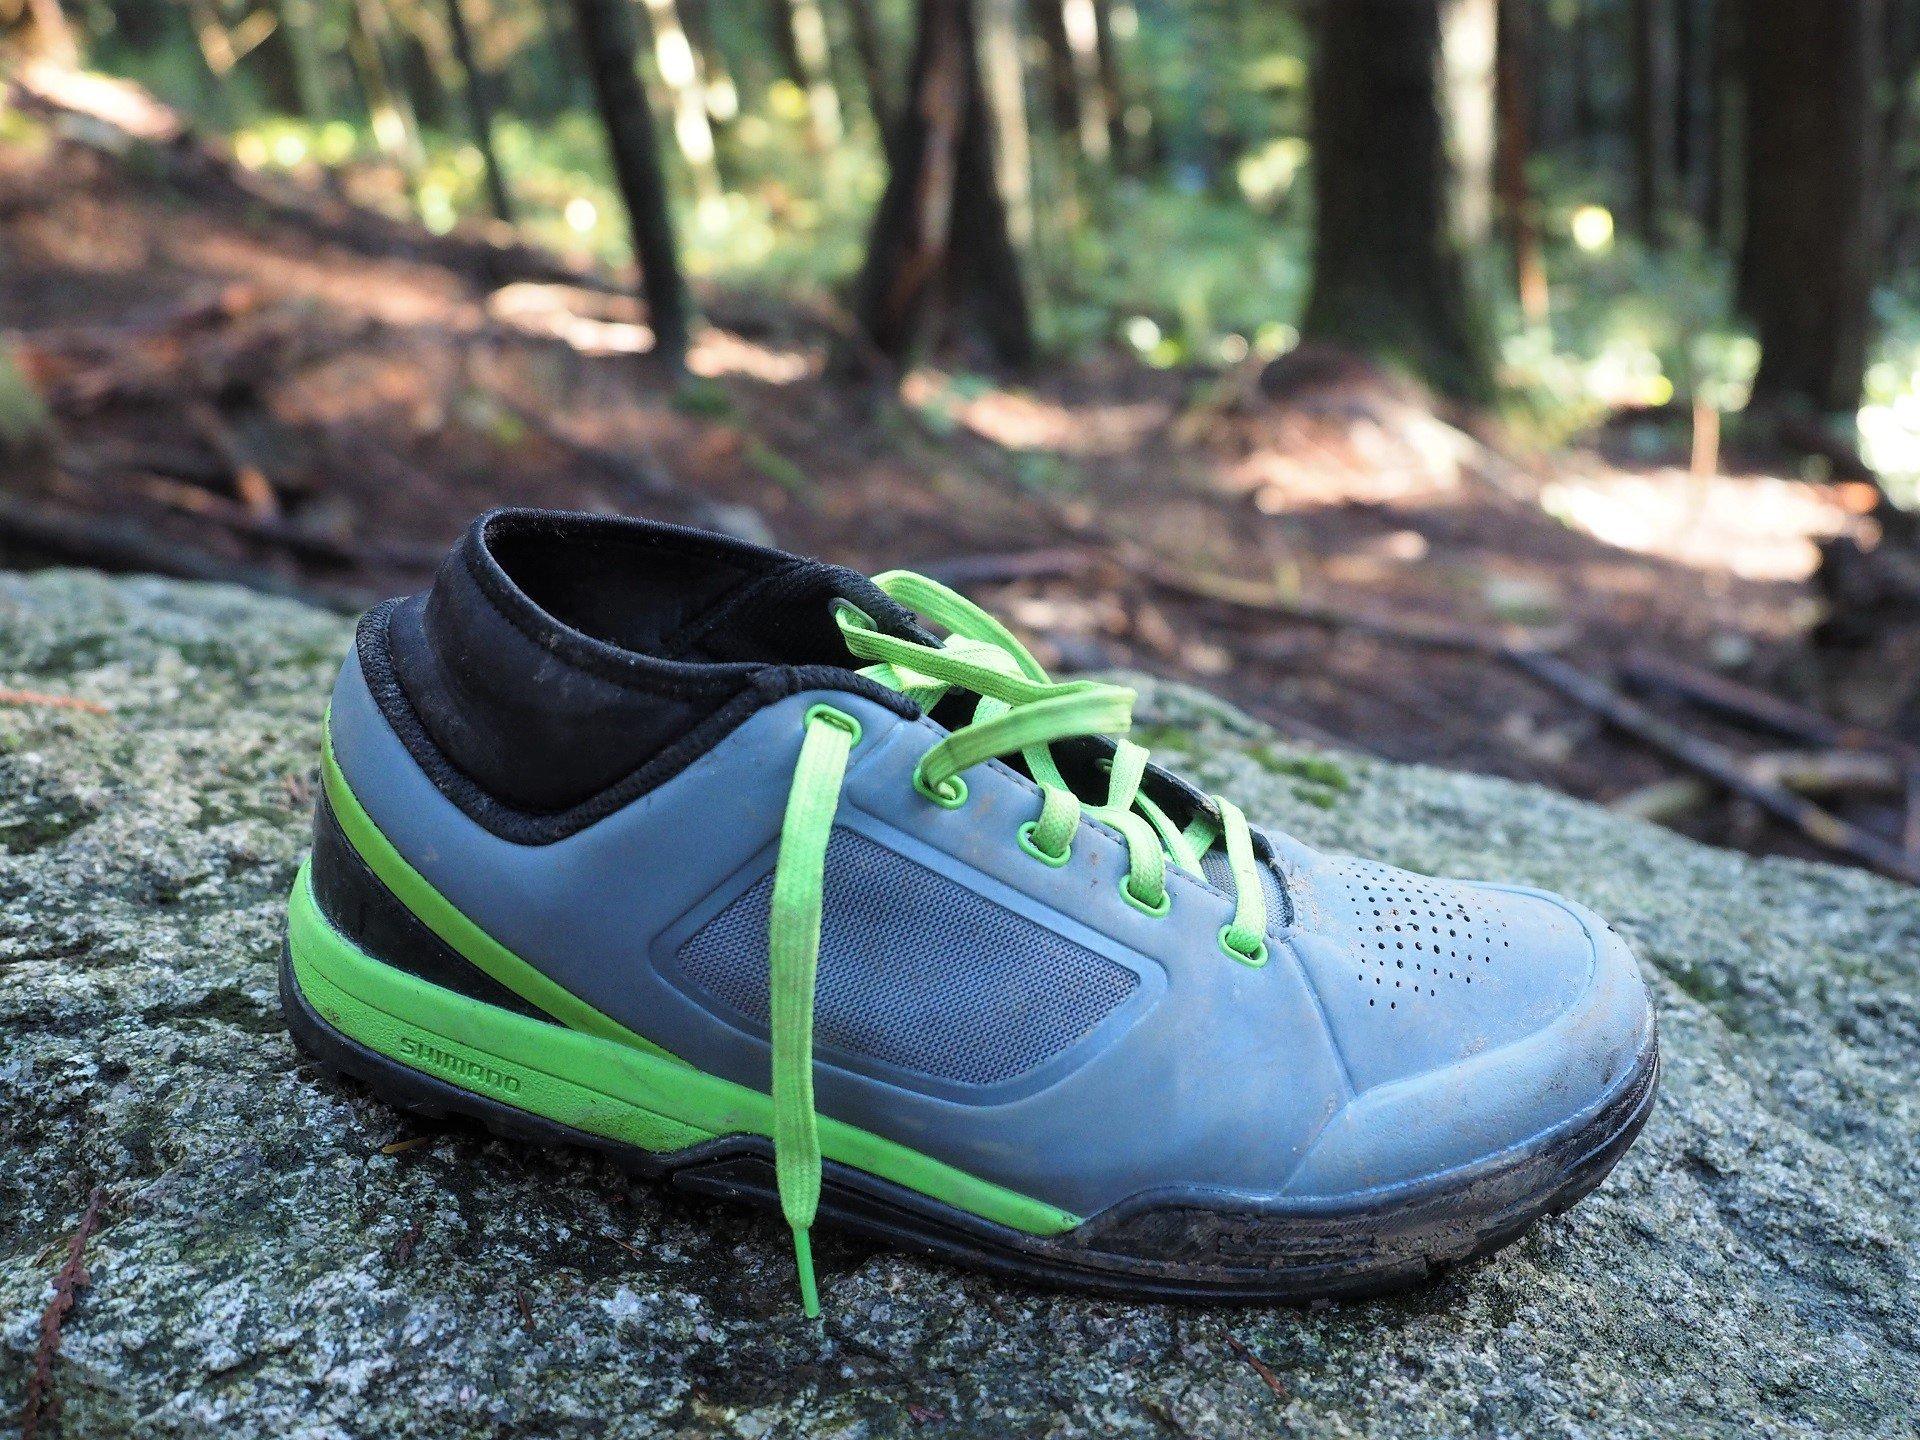 Shimano GR7 Flat Pedal Shoes